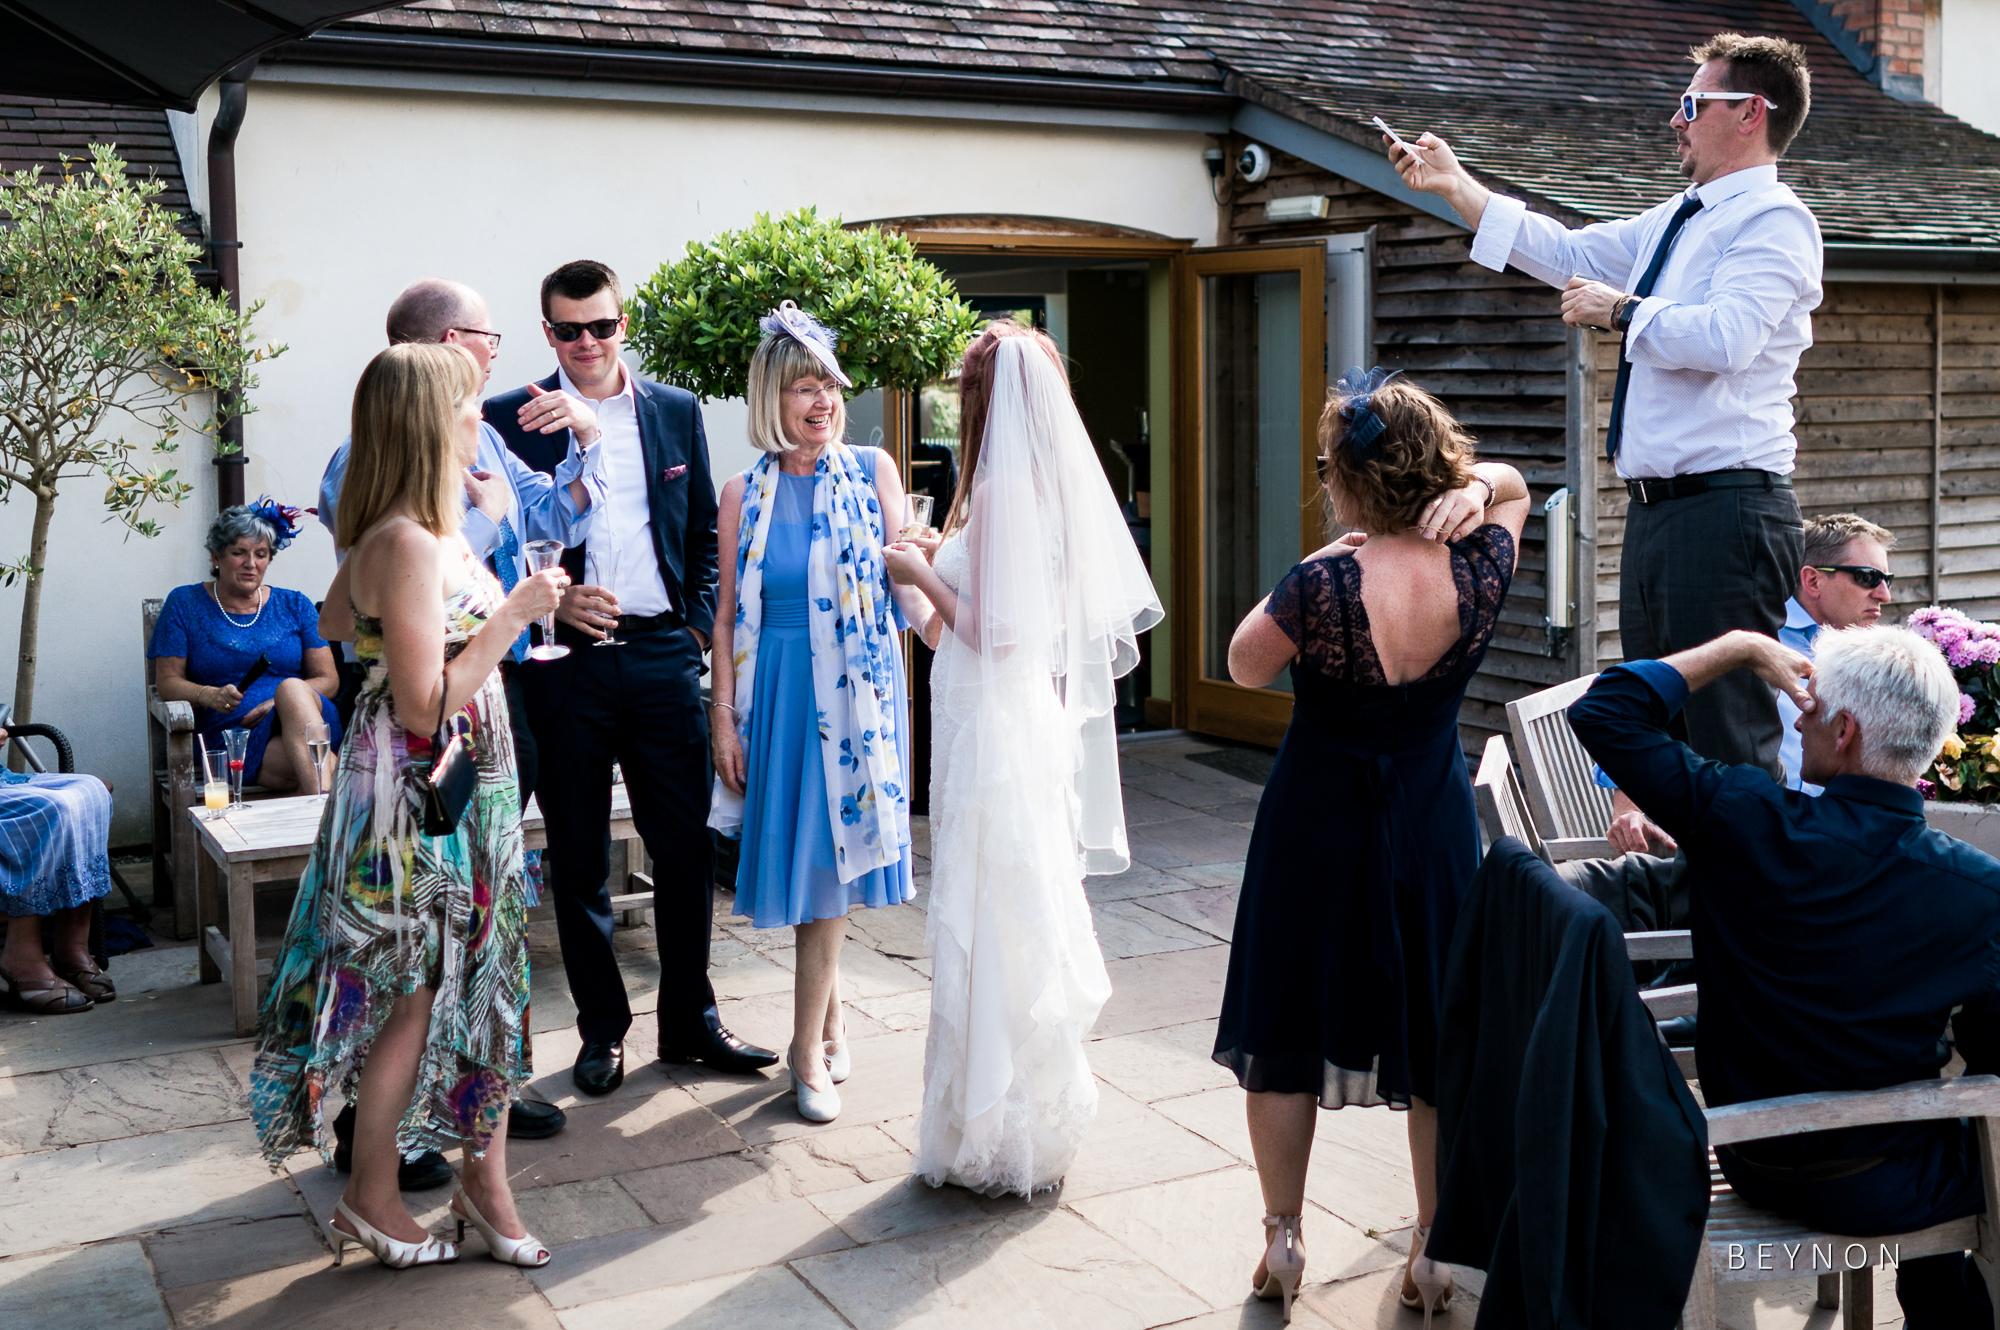 Wedding reception scene